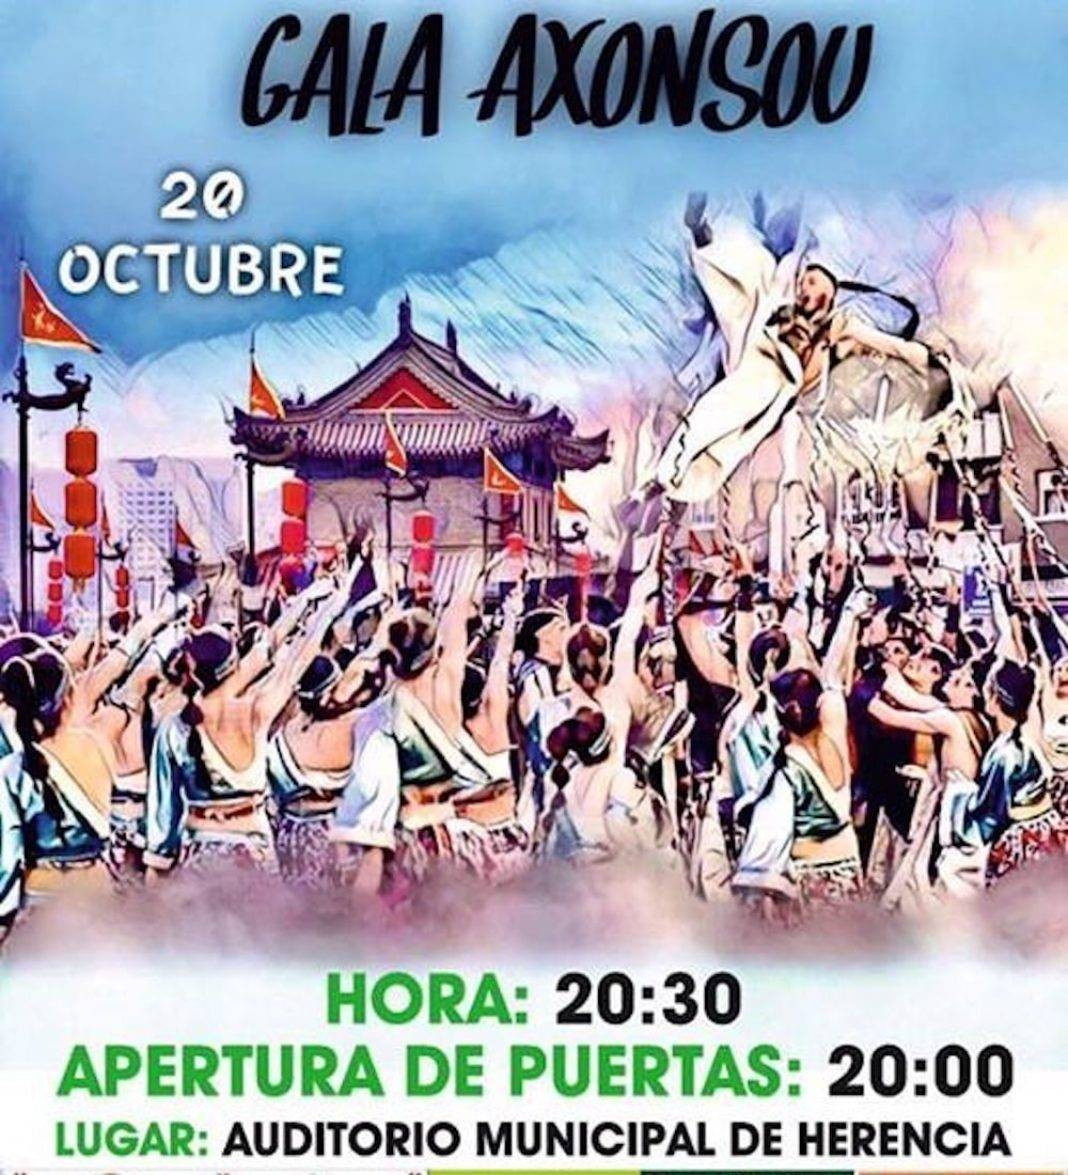 gala axonsou 2018 1068x1175 - Axonsou celebrará su Gala 2018 en el Auditorio Municipal